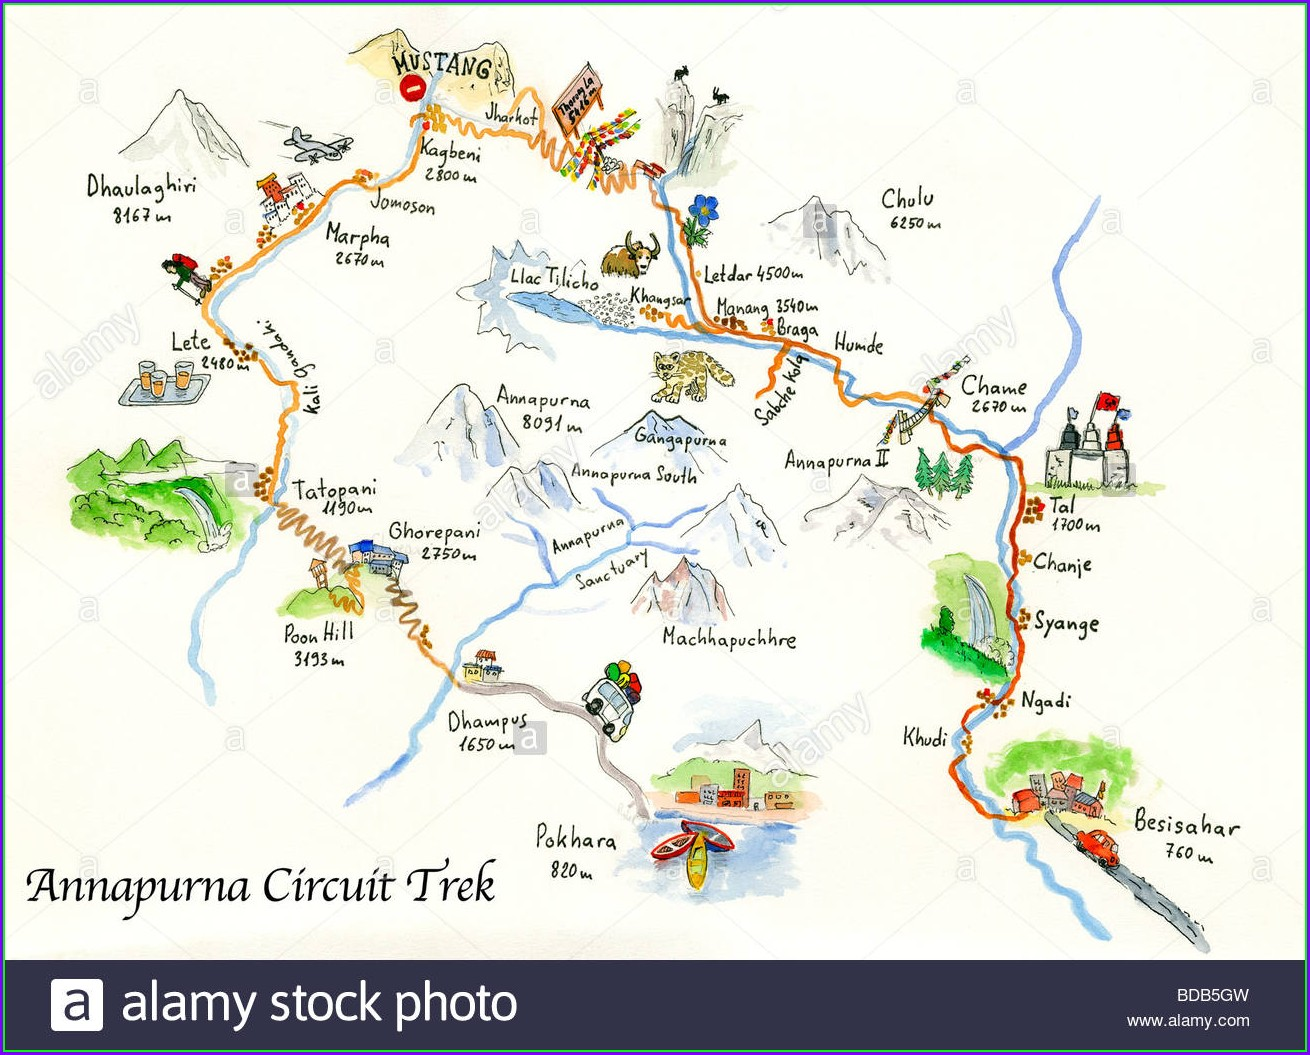 Annapurna Circuit Map Download